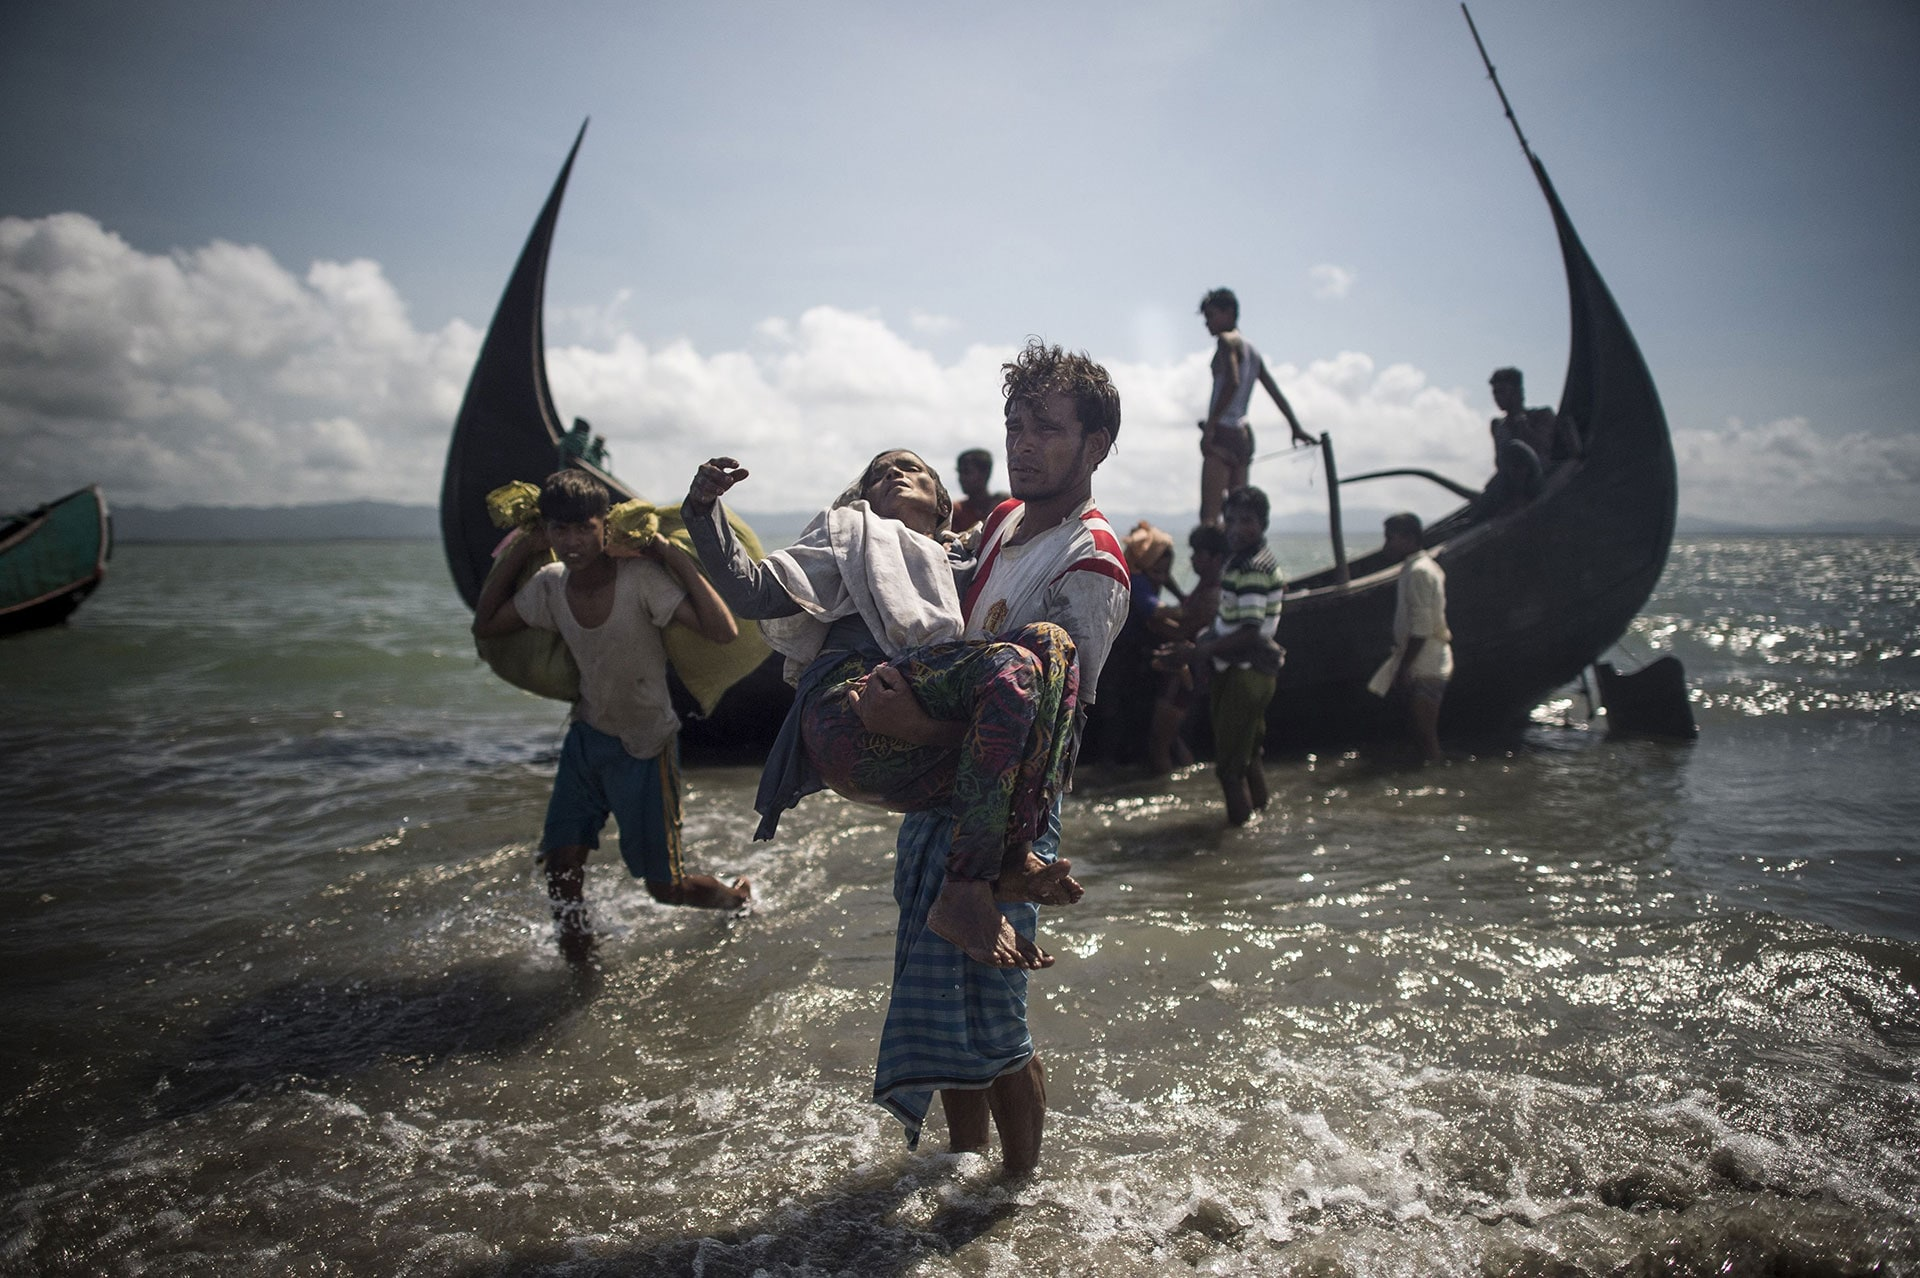 A Bangladeshi man helps Rohingya Muslim refugees